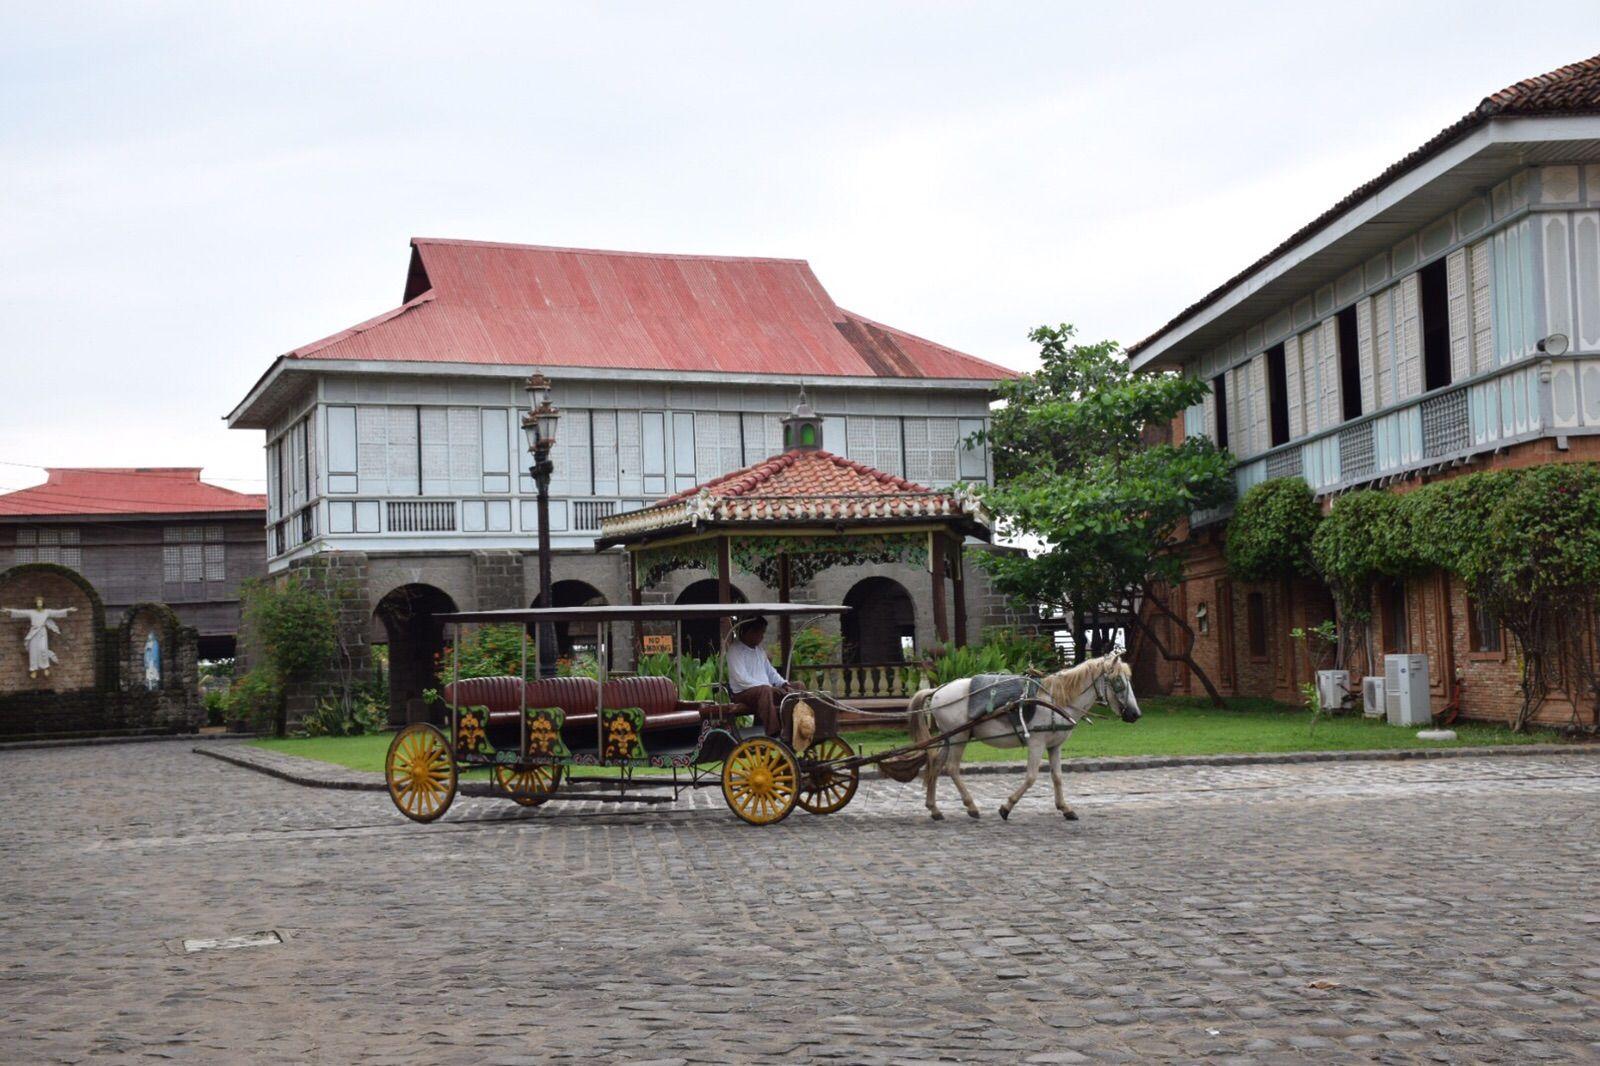 Bataan, Philippines... A European Illusion http://www.tripoto.com/trip/bataan-philippines-a-european-illusion-5664e2aeb26d8  #Bag #tripoto #travel #travels #city